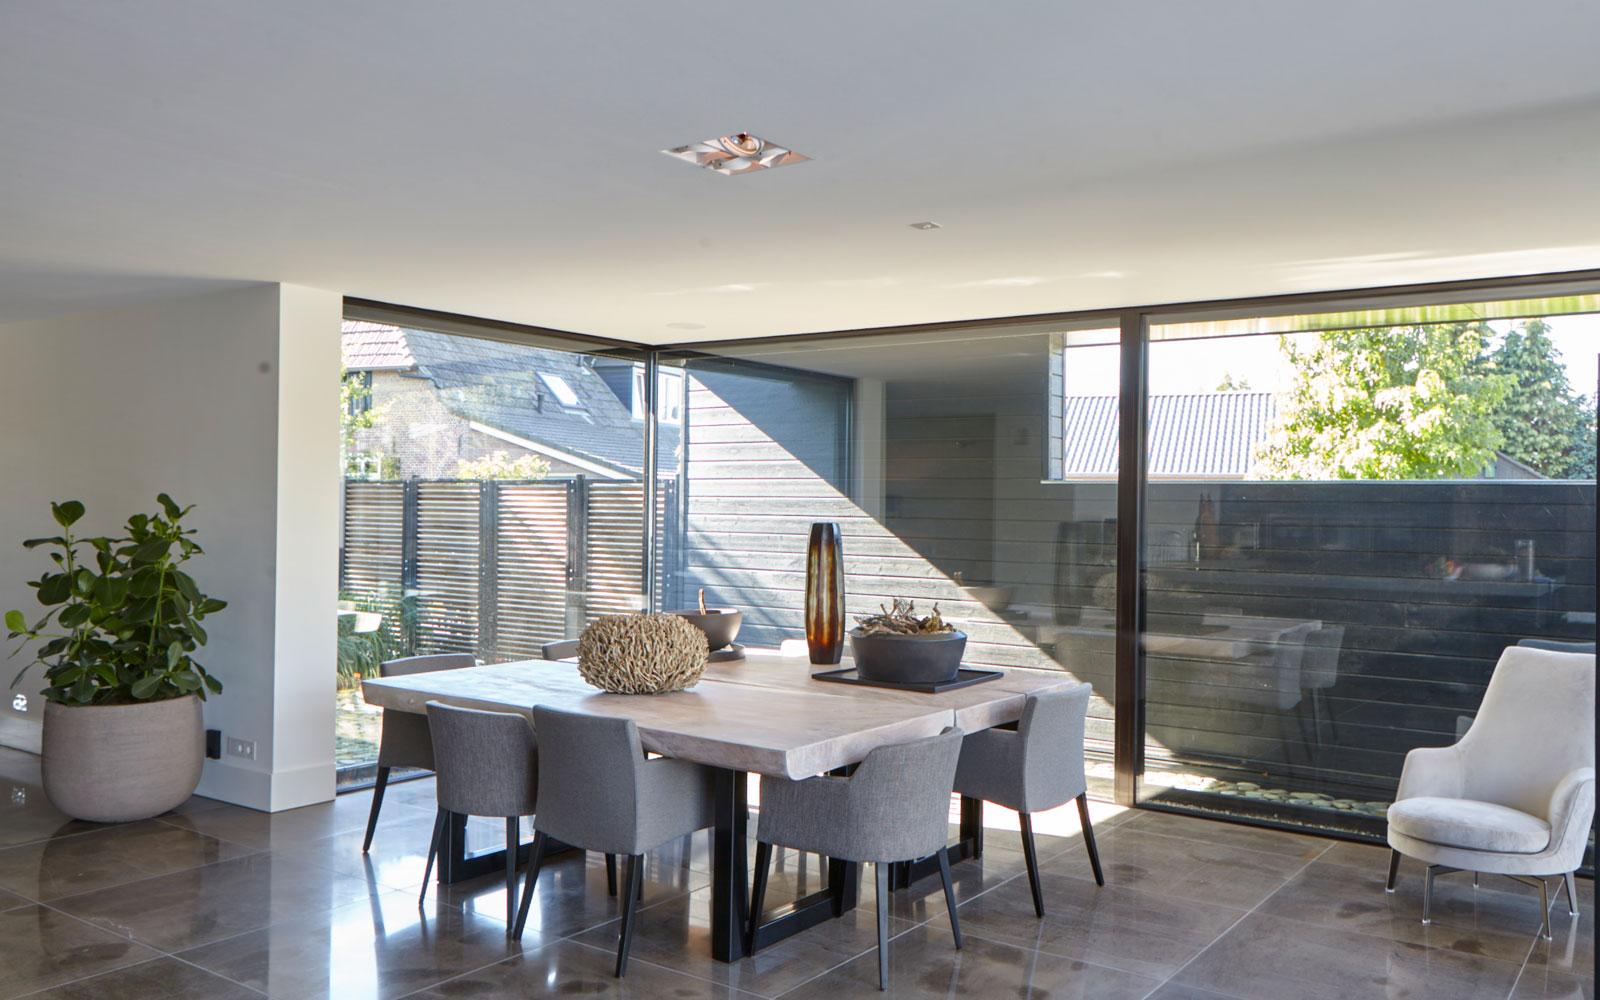 Eetkamer, leefkeuken, grote ramen, vloer, natuursteen, Revy Stone, ultramoderne villa, Bob Manders